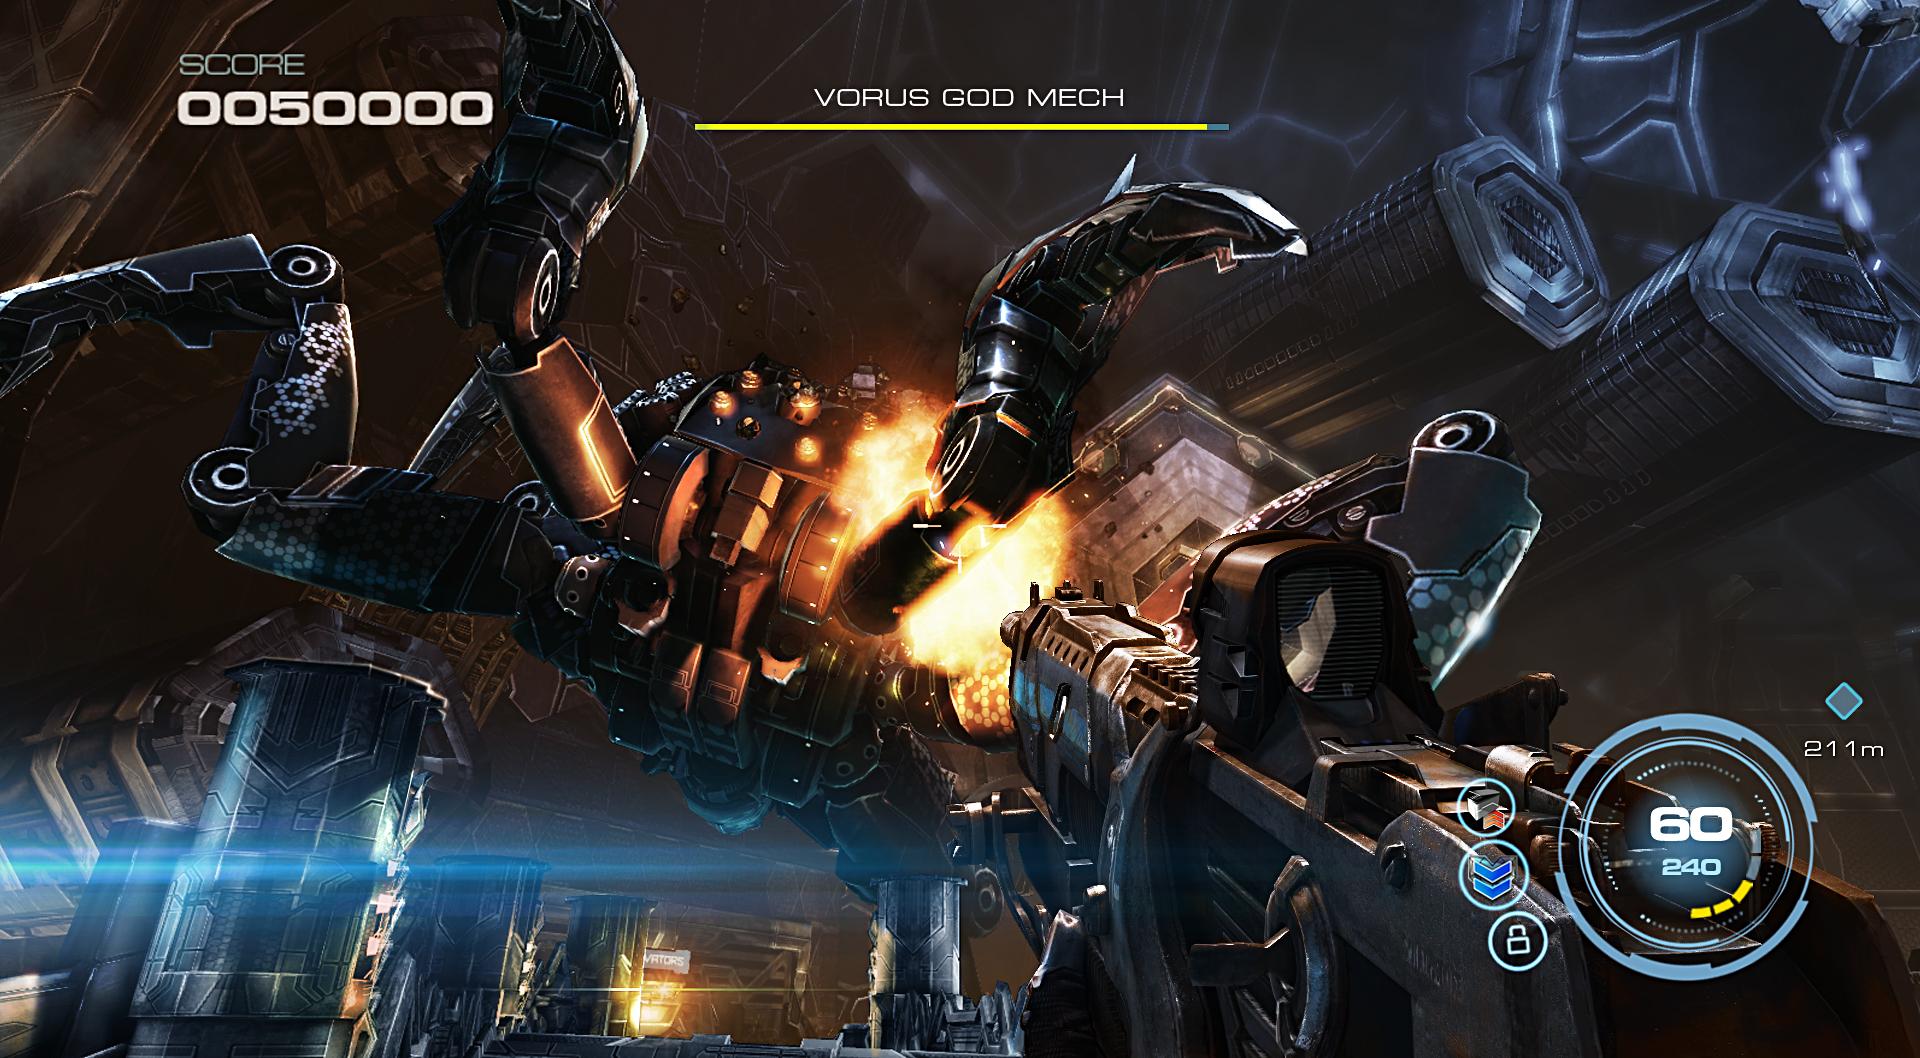 Obrázky z inFamous, NFS: Rivals, FIFA 14, Alien Rage 86389